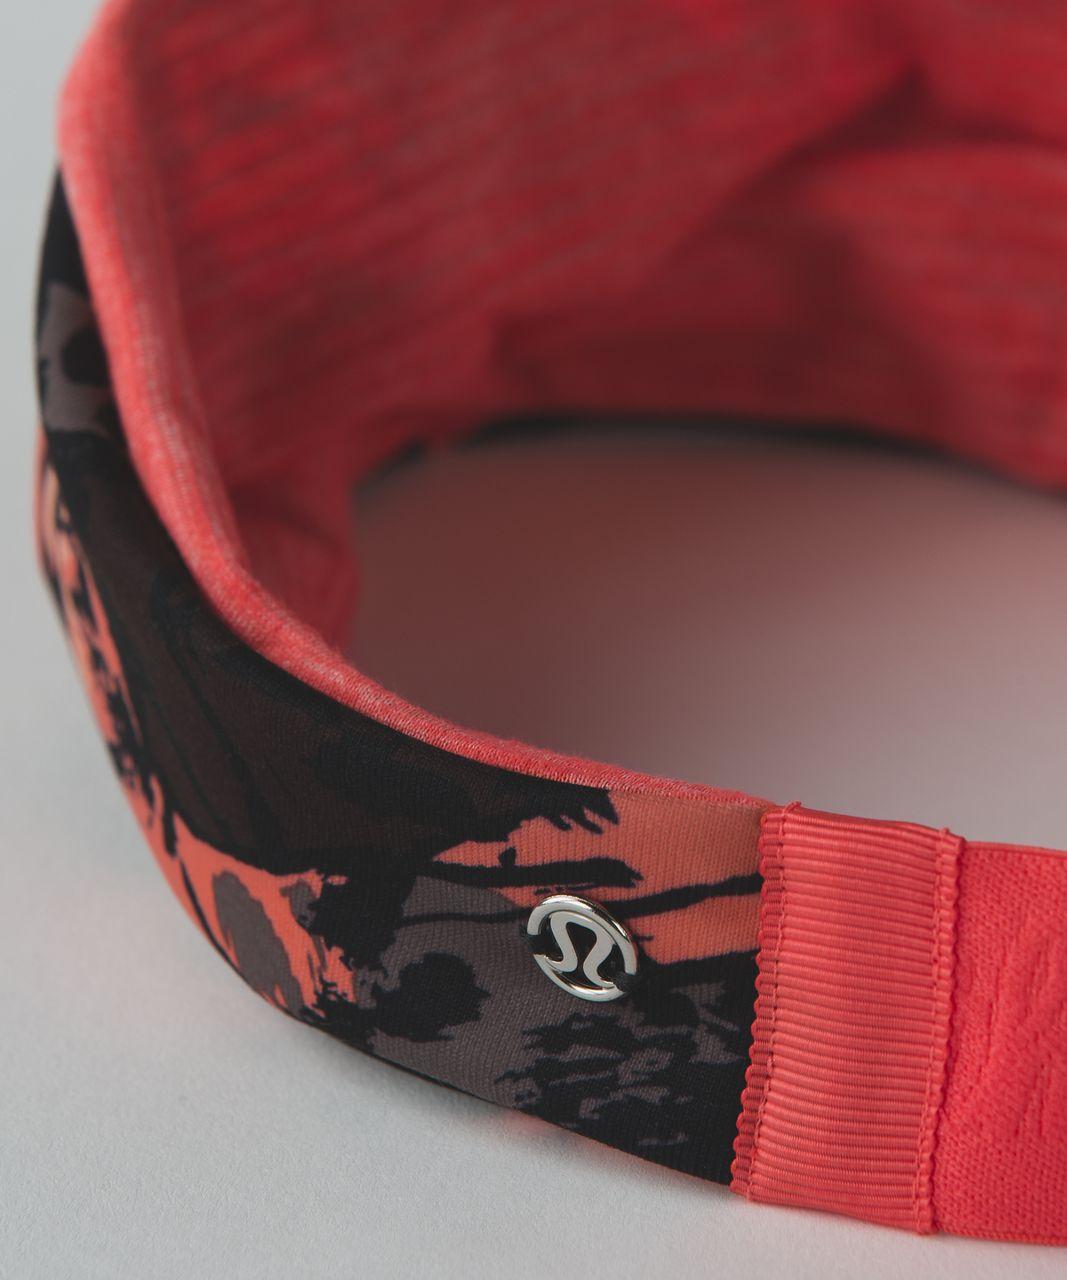 Lululemon Fringe Fighter Headband - Paint Storm Espresso Multi / Heathered Cape Red